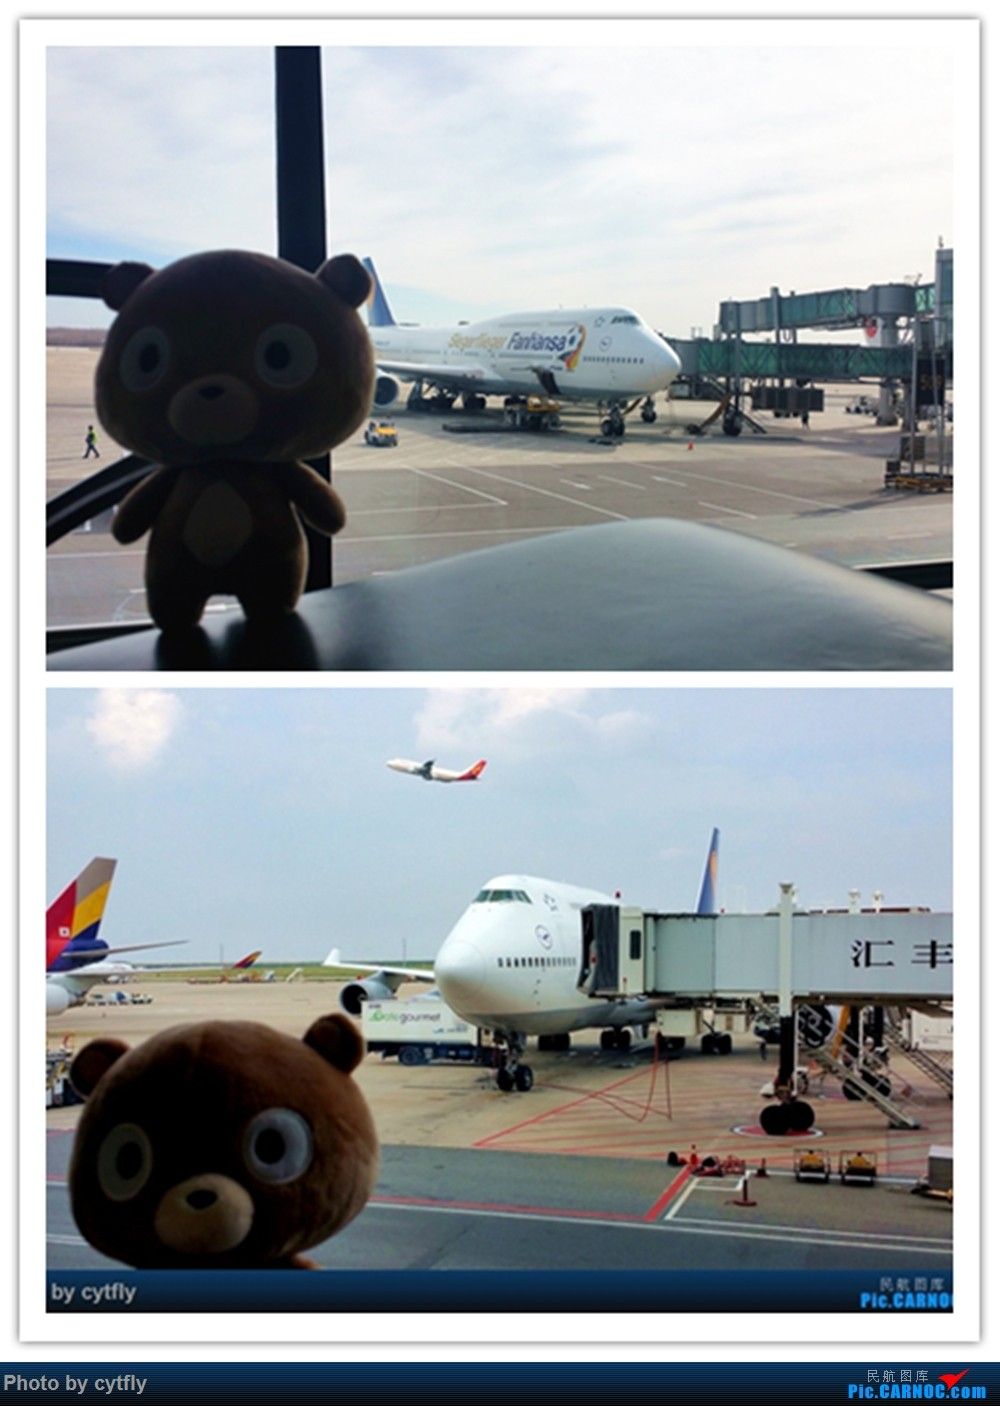 Re:[原创]【北向の飞行】澳门出差7日行——离职前最后一次搭乘澳门航空飞行 BOEING 747-8I  北京首都国际机场